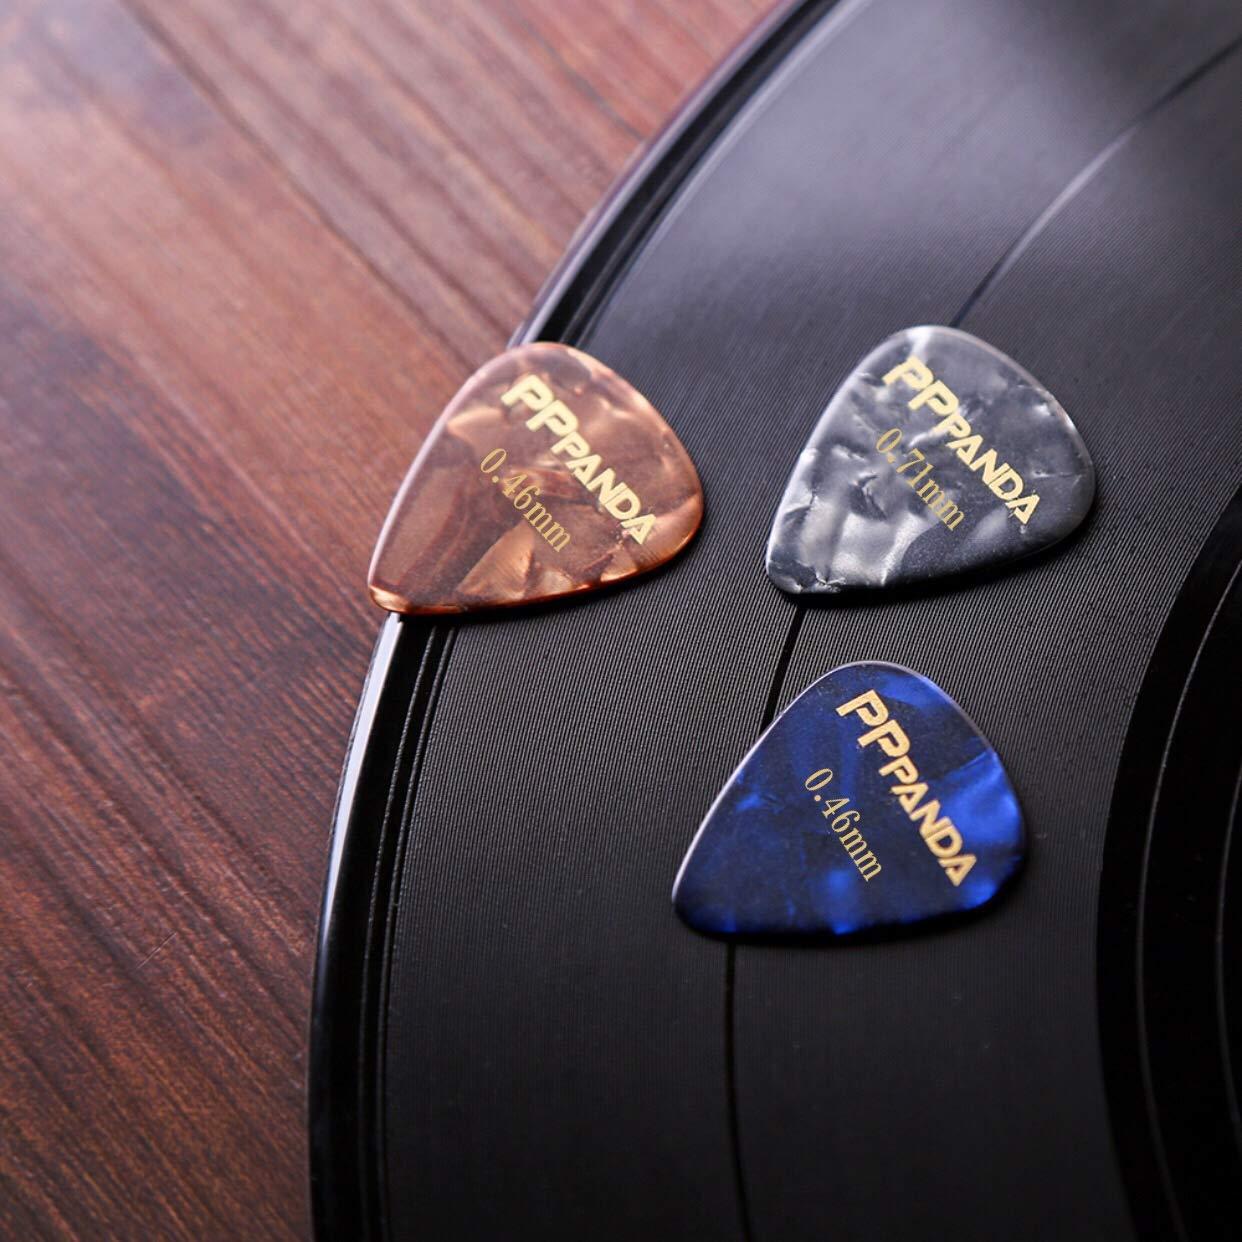 or Bass Guitar Thin PPpanda Guitar Picks 24 pcs Guitar Plectrums for Your Electric Acoustic Medium,0.46 0.71 mm